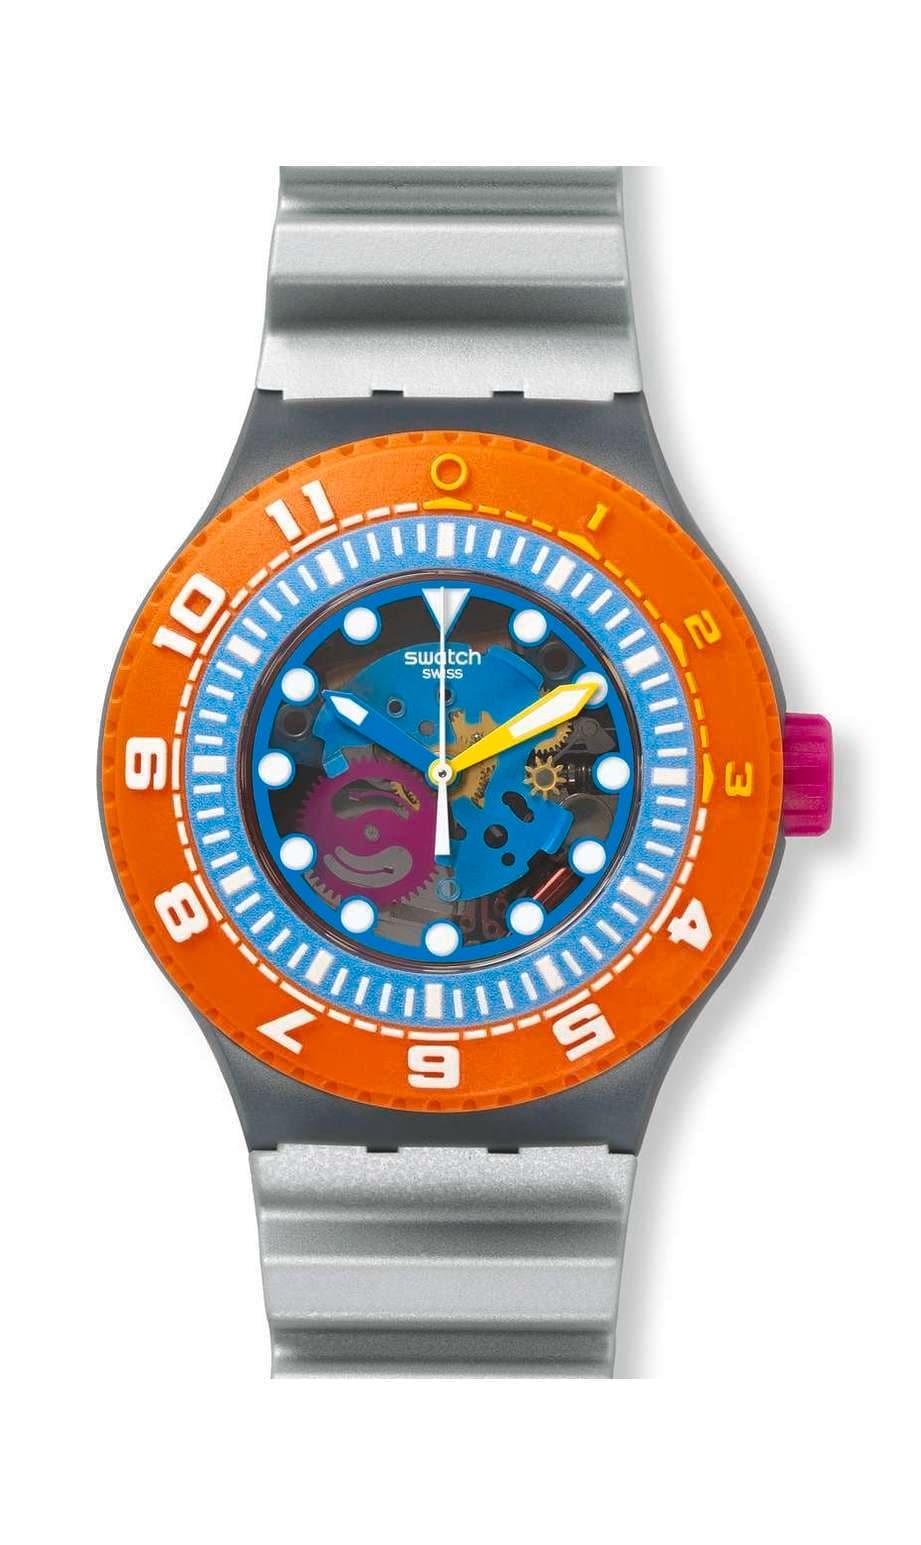 Swatch - SEA-THROUGH - 1